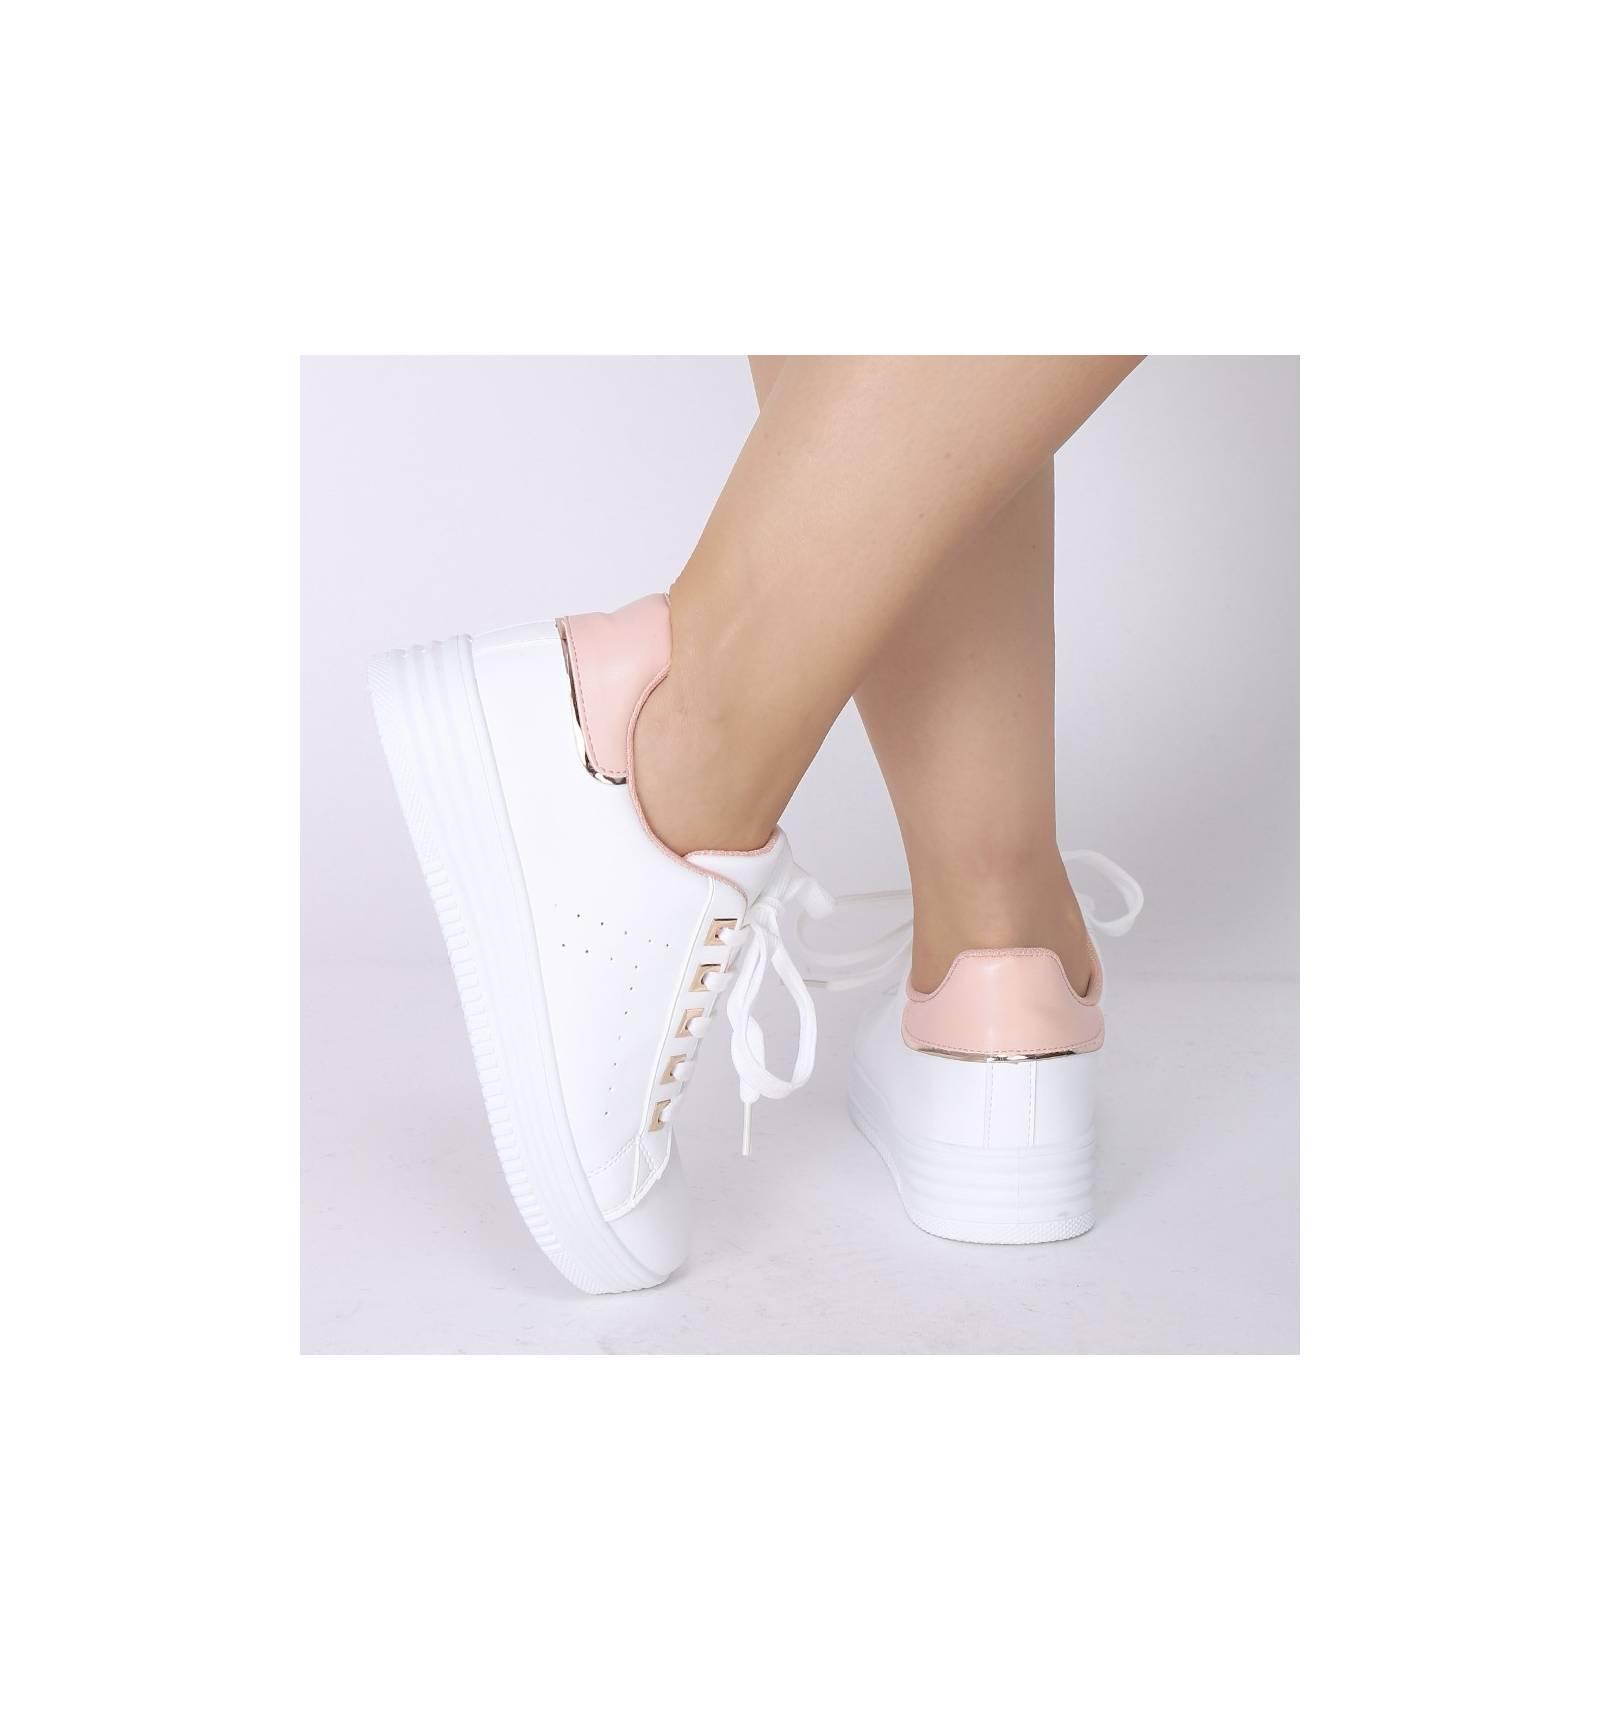 belle chaussure pas cher femme